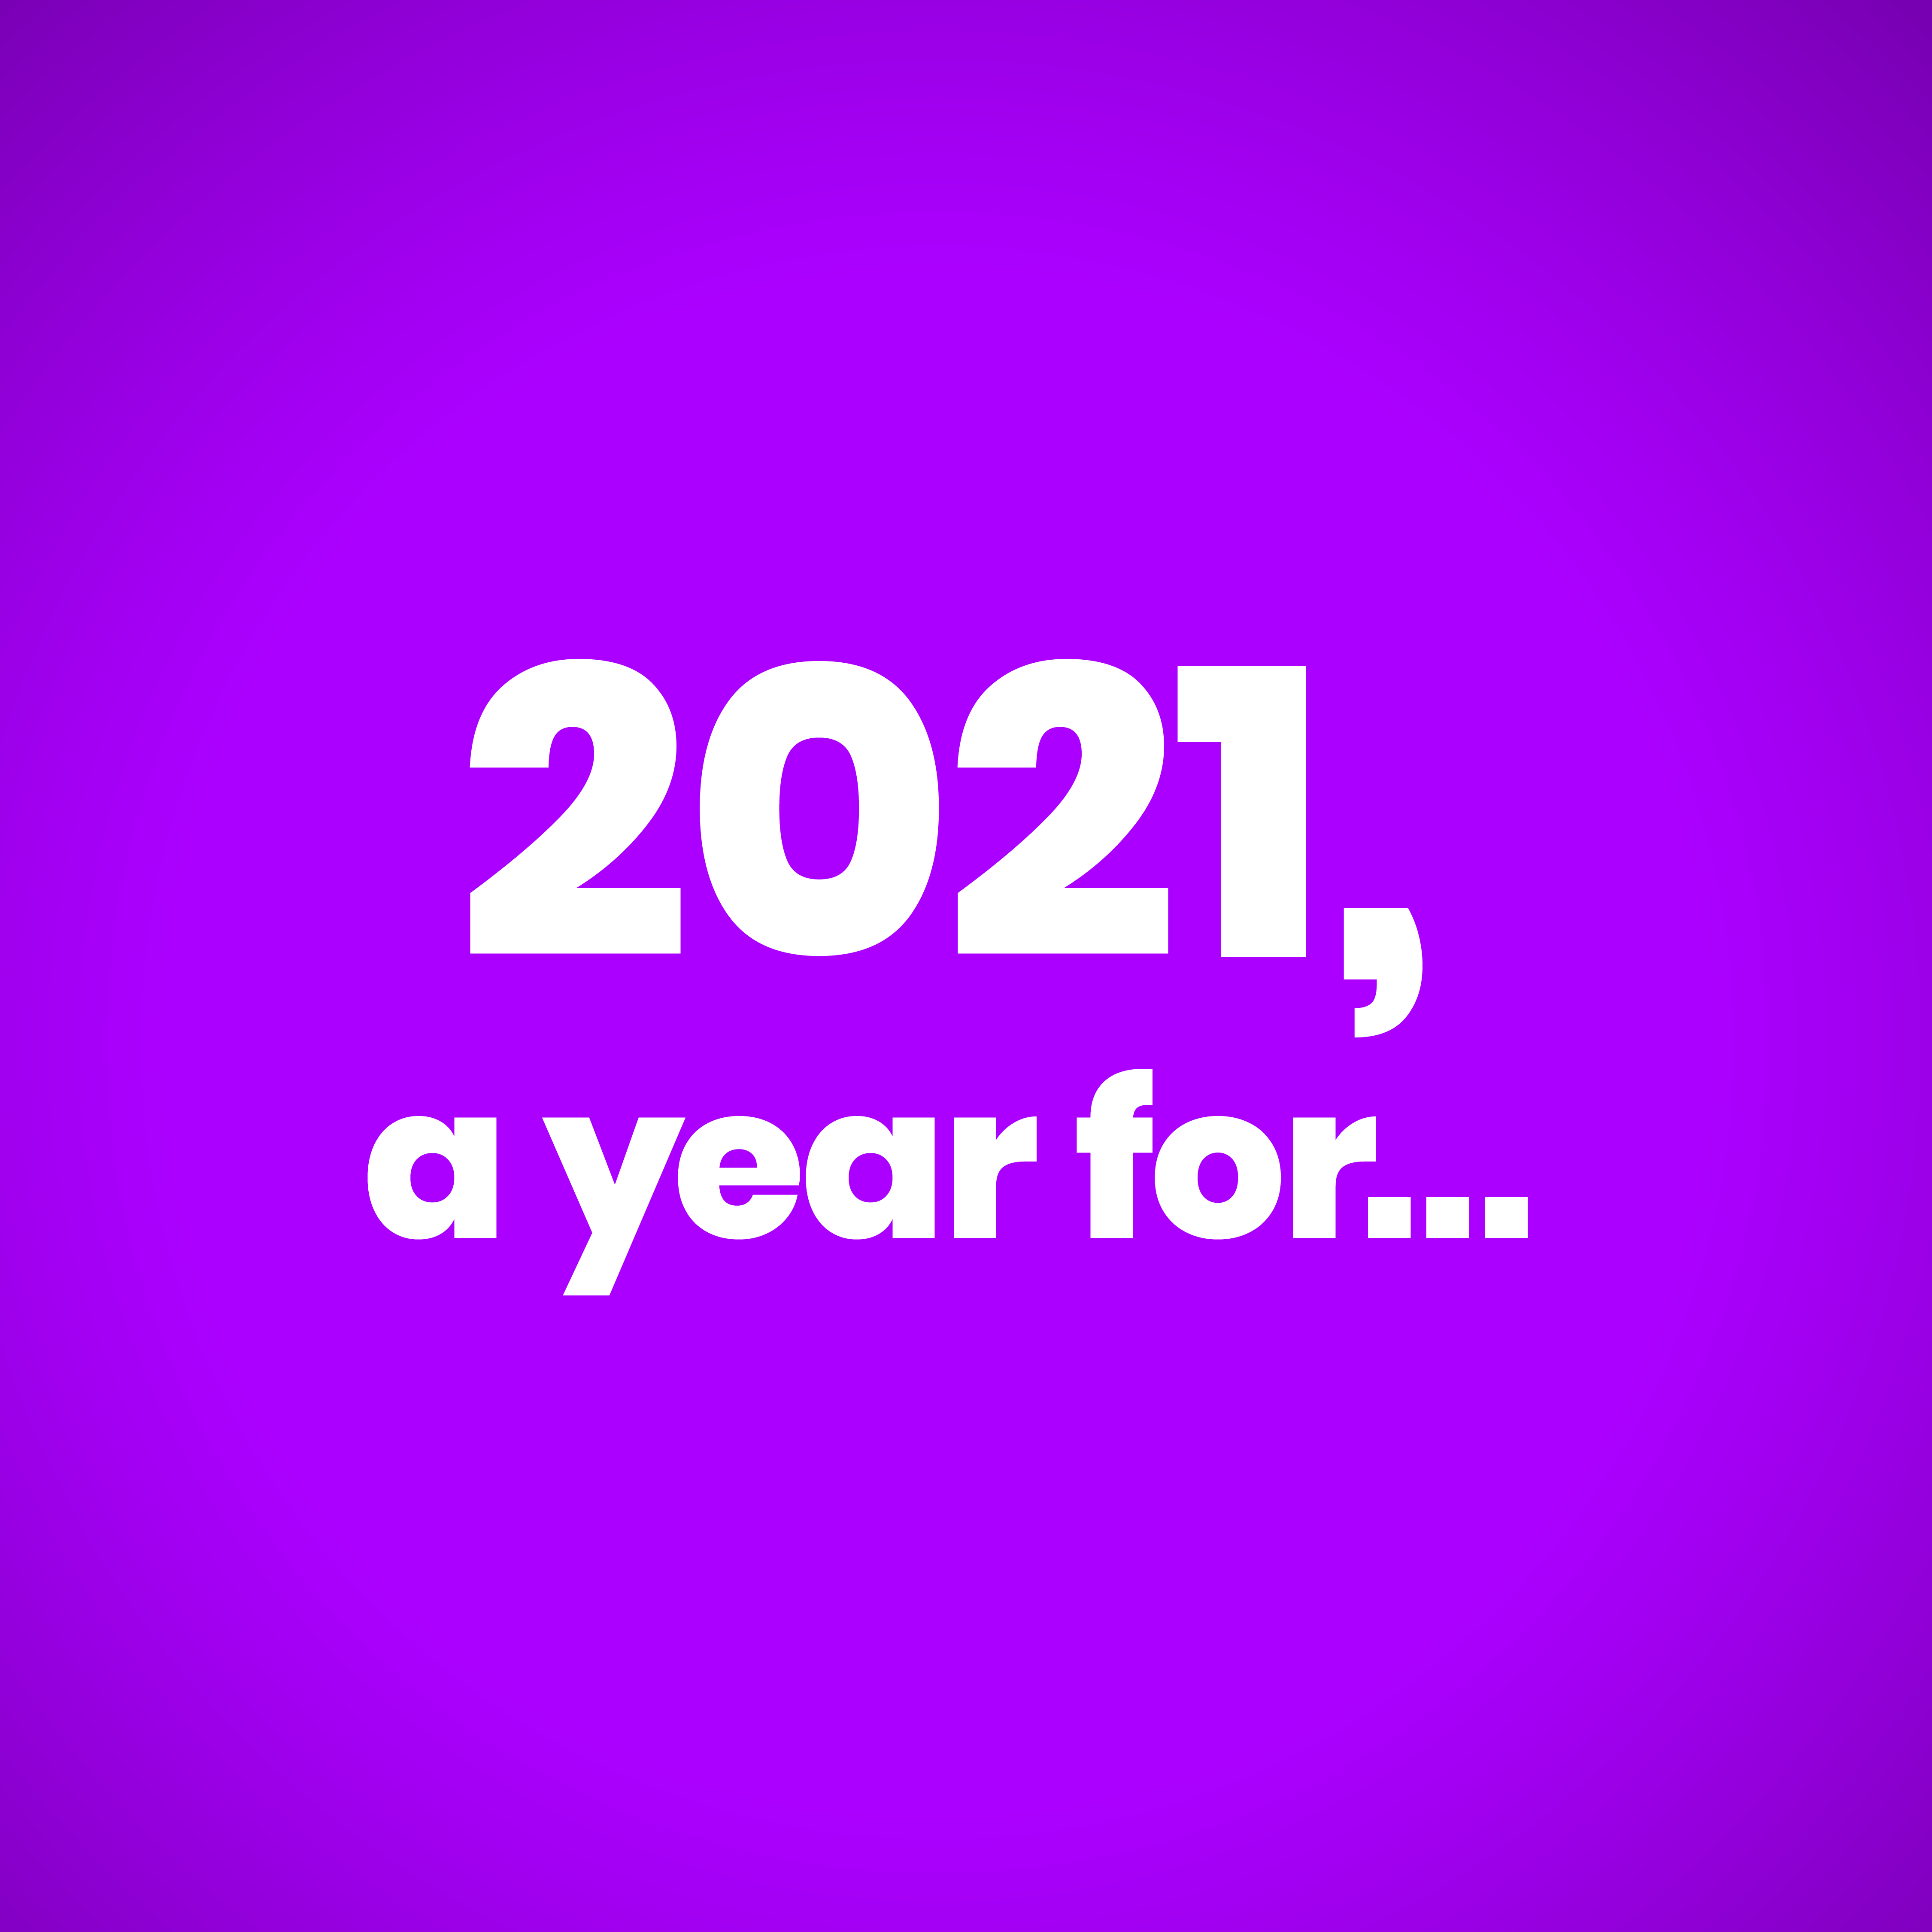 #2021AYearFor